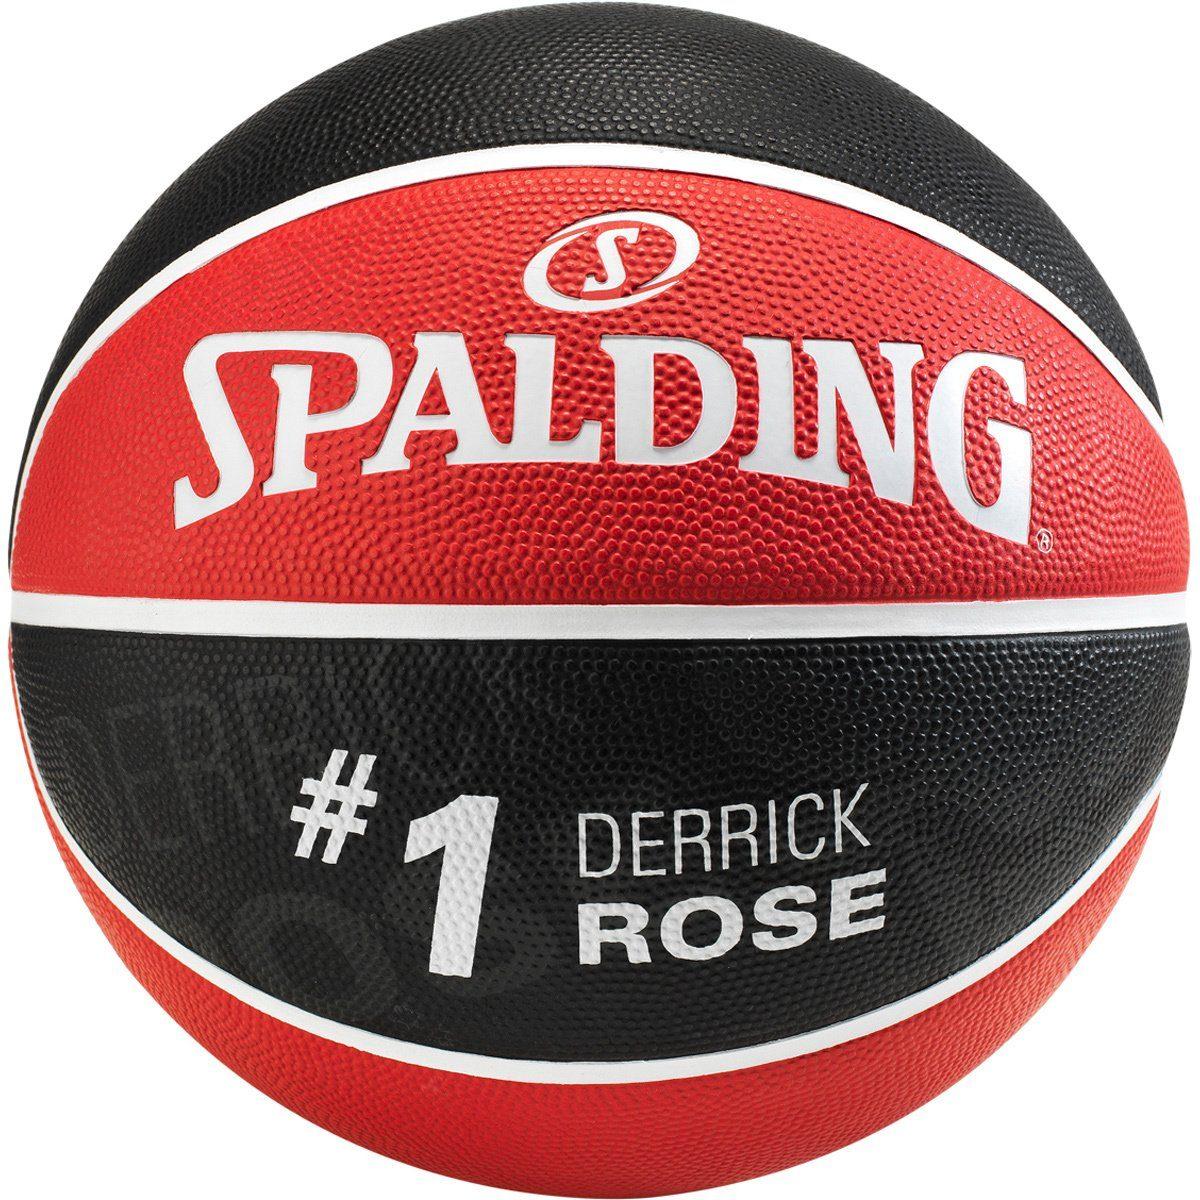 SPALDING NBA Player Derrick Rose Basketball